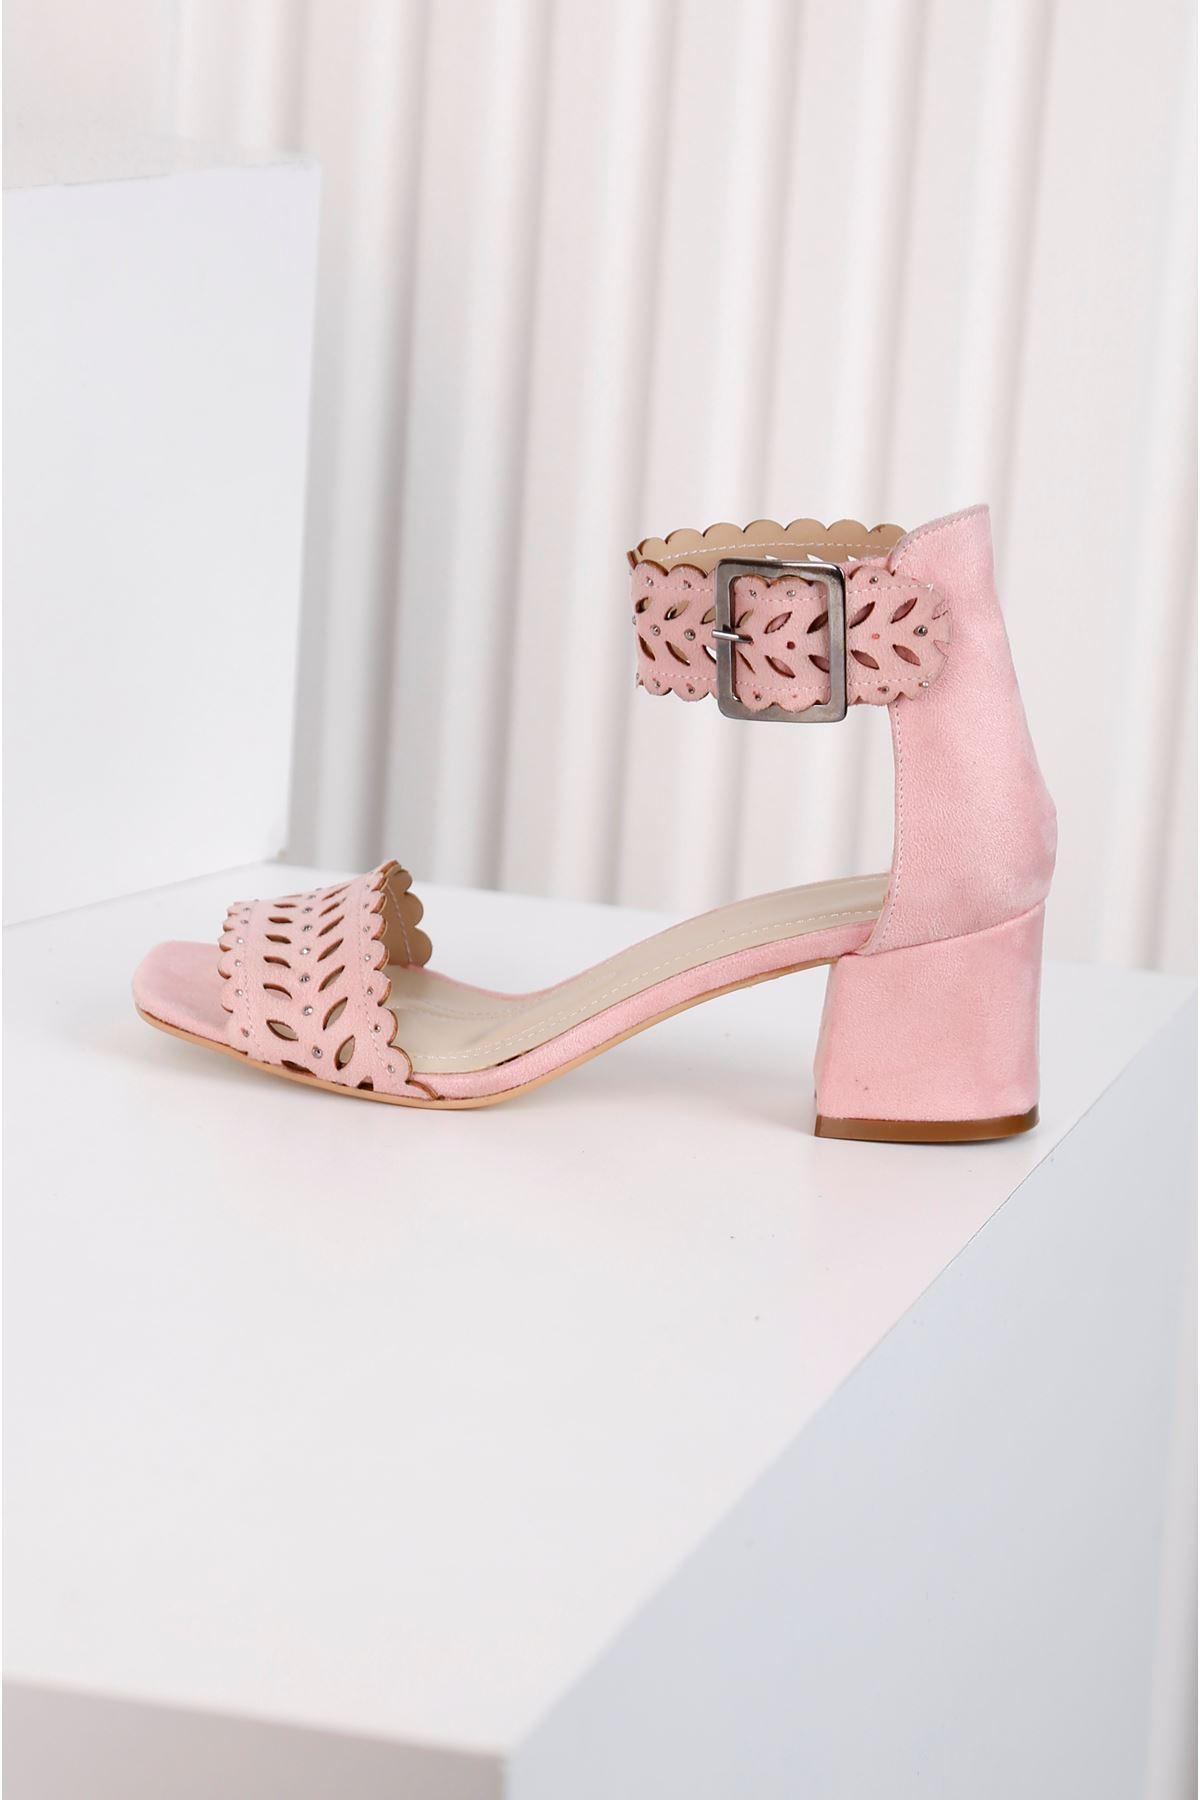 Ribbon Pembe Taş Kaplama Lazer Kesim Ayakkabı